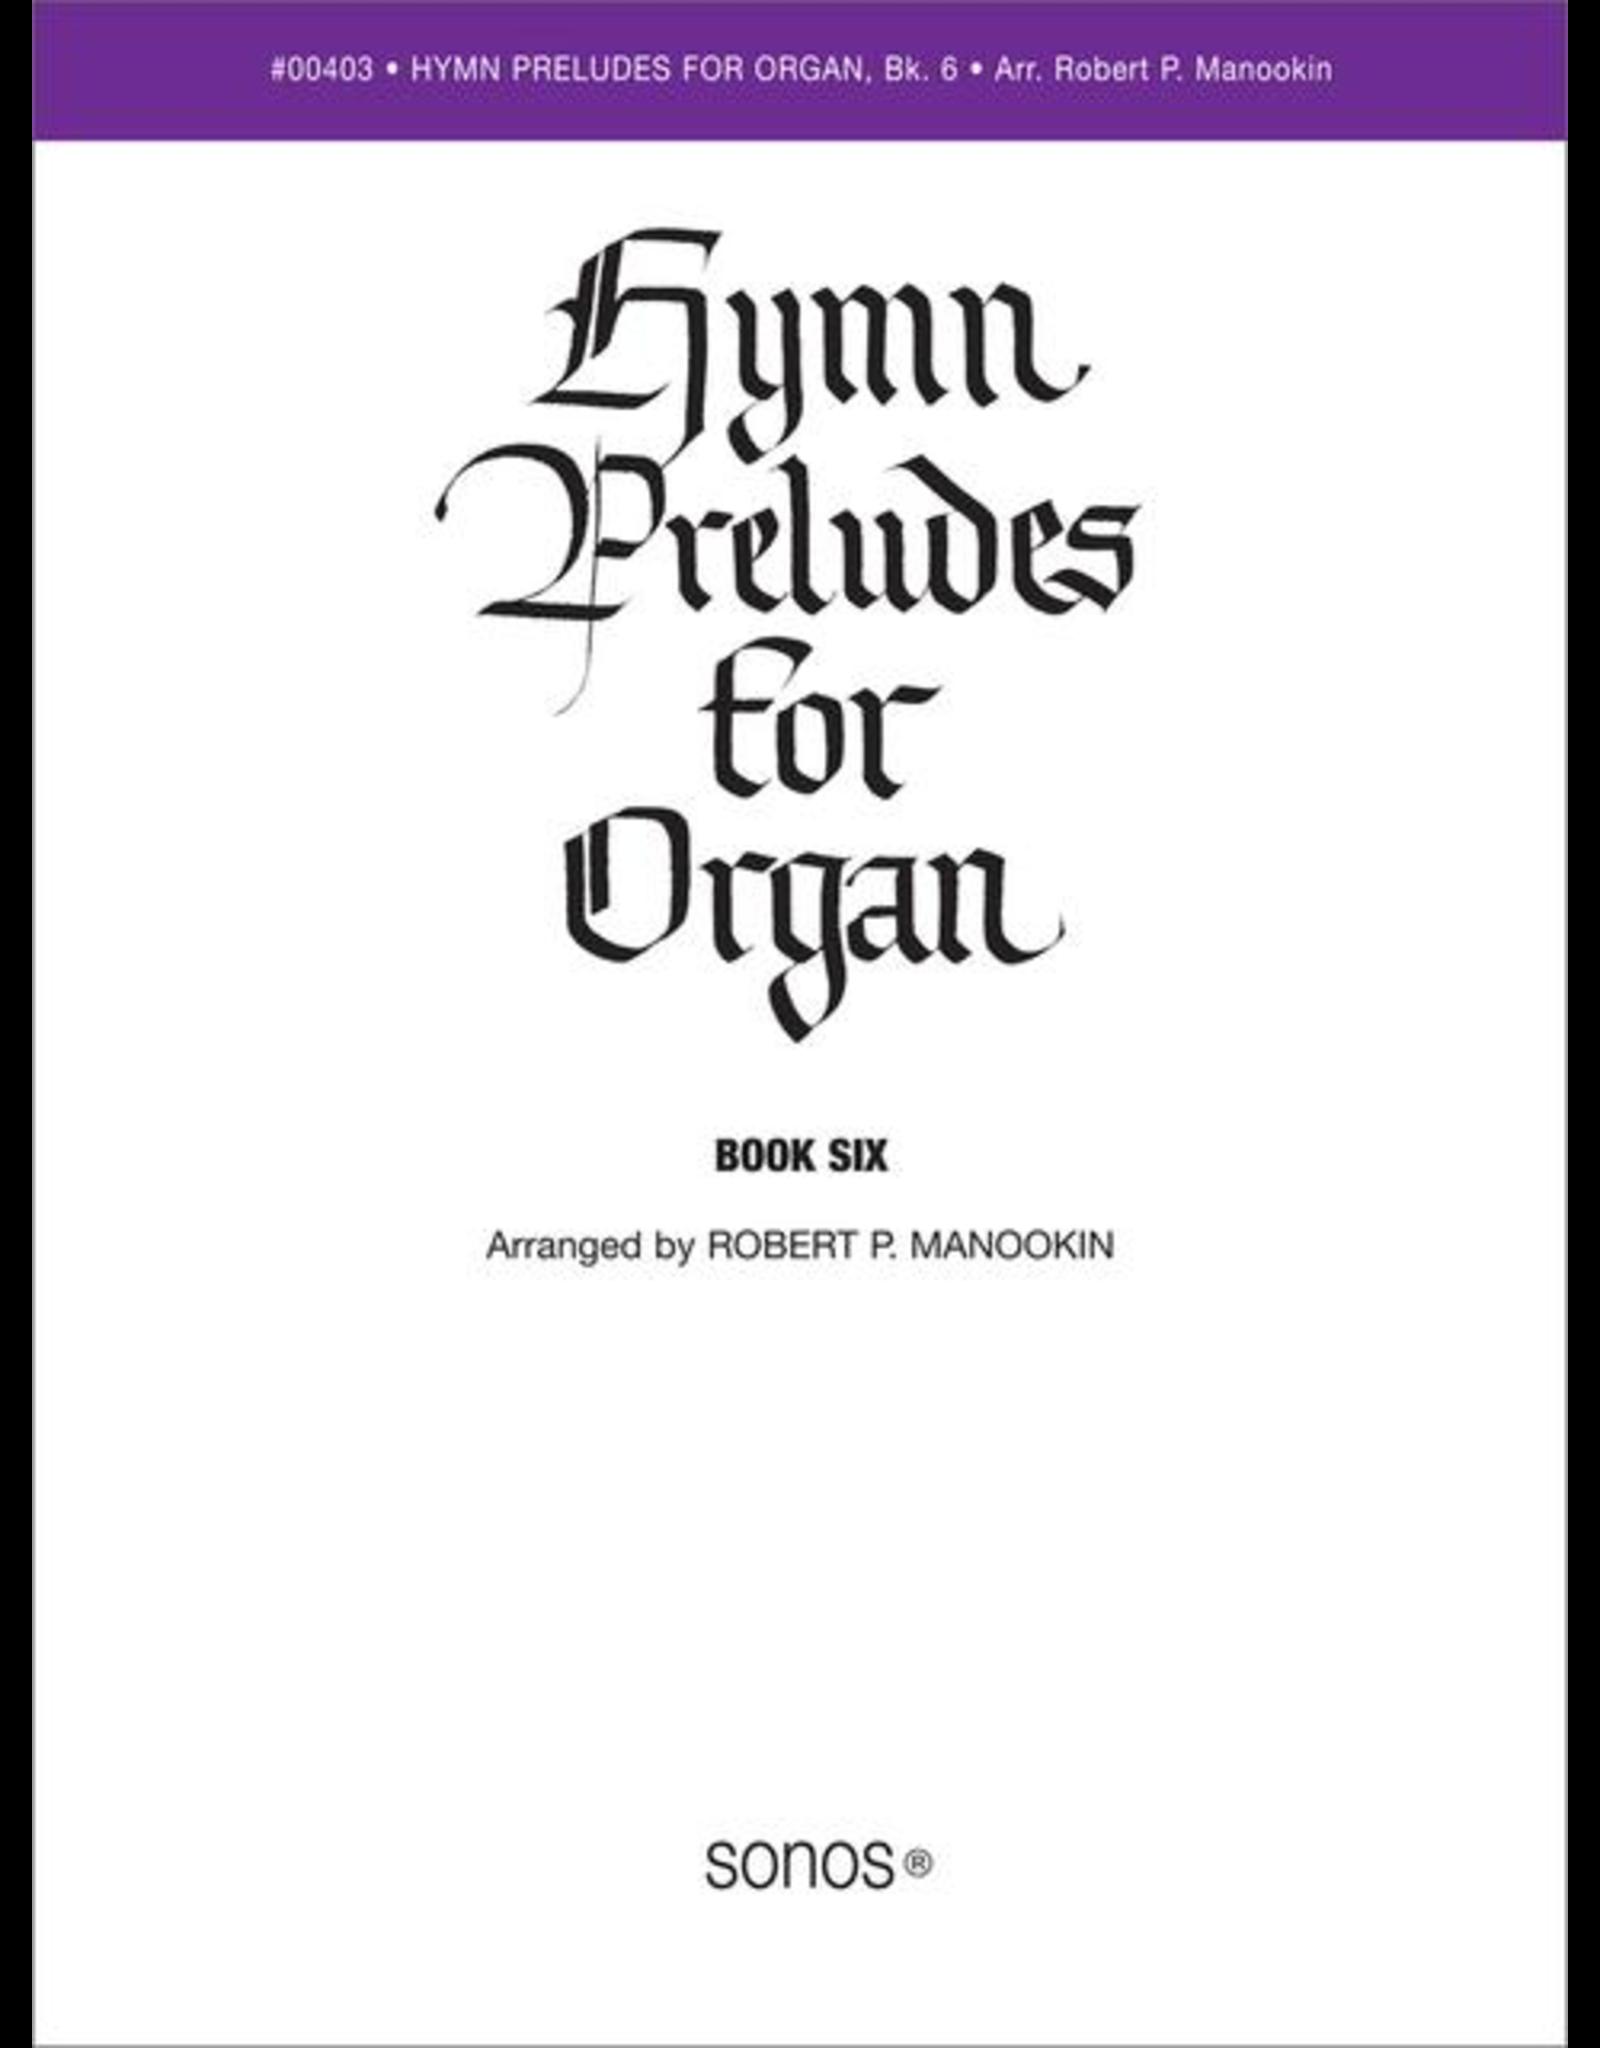 Jackman Music Hymn Preludes for Organ Book 6 arr. Robert P. Manookin